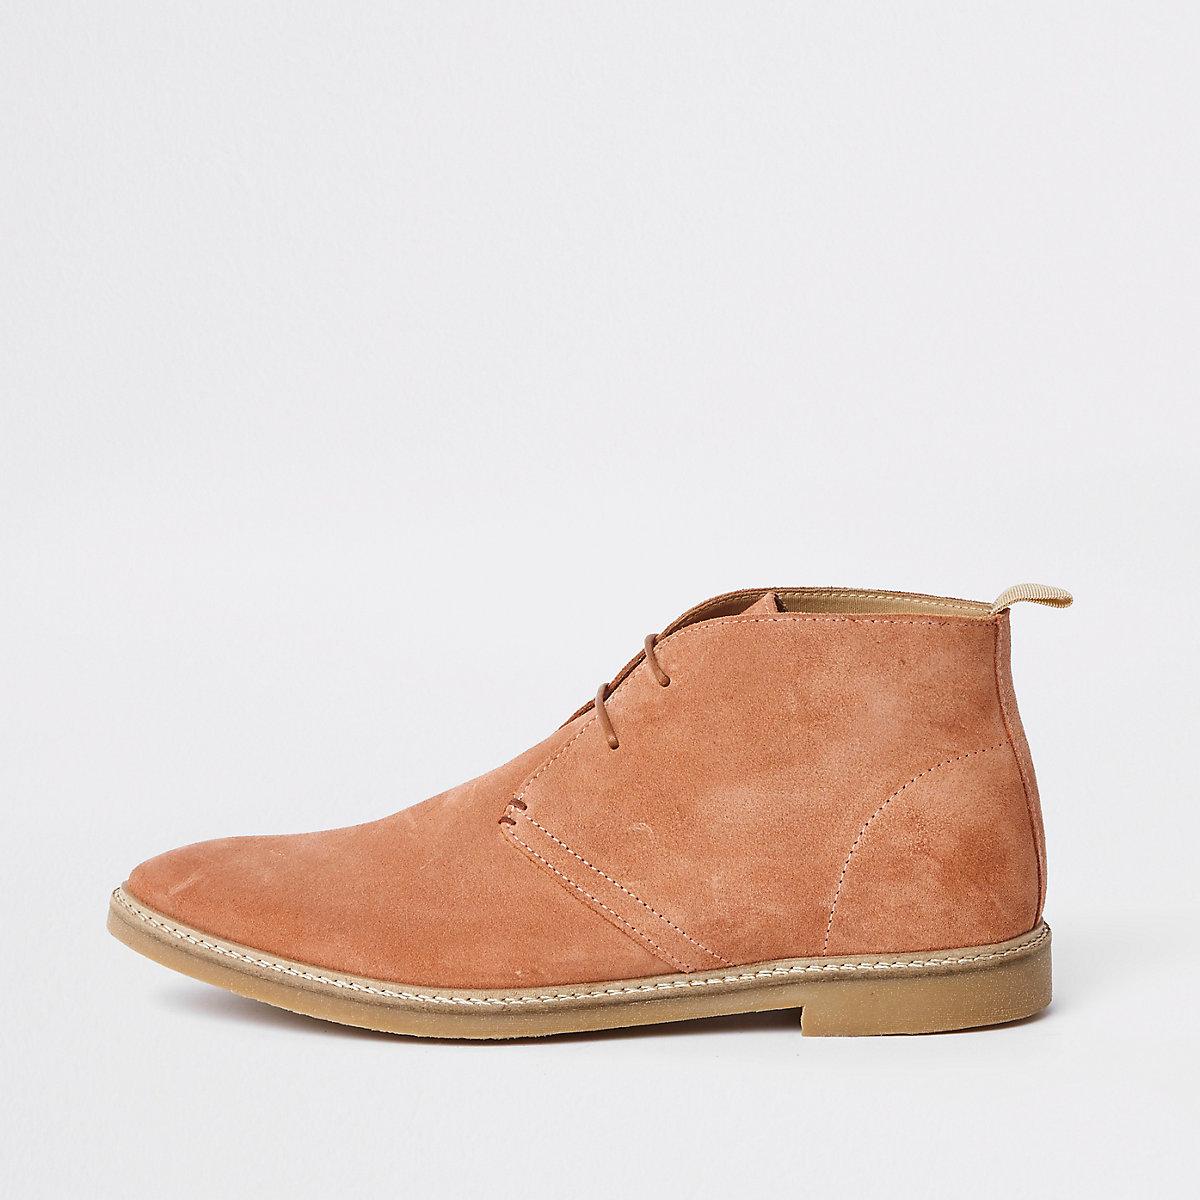 Pink suede eyelet desert boots